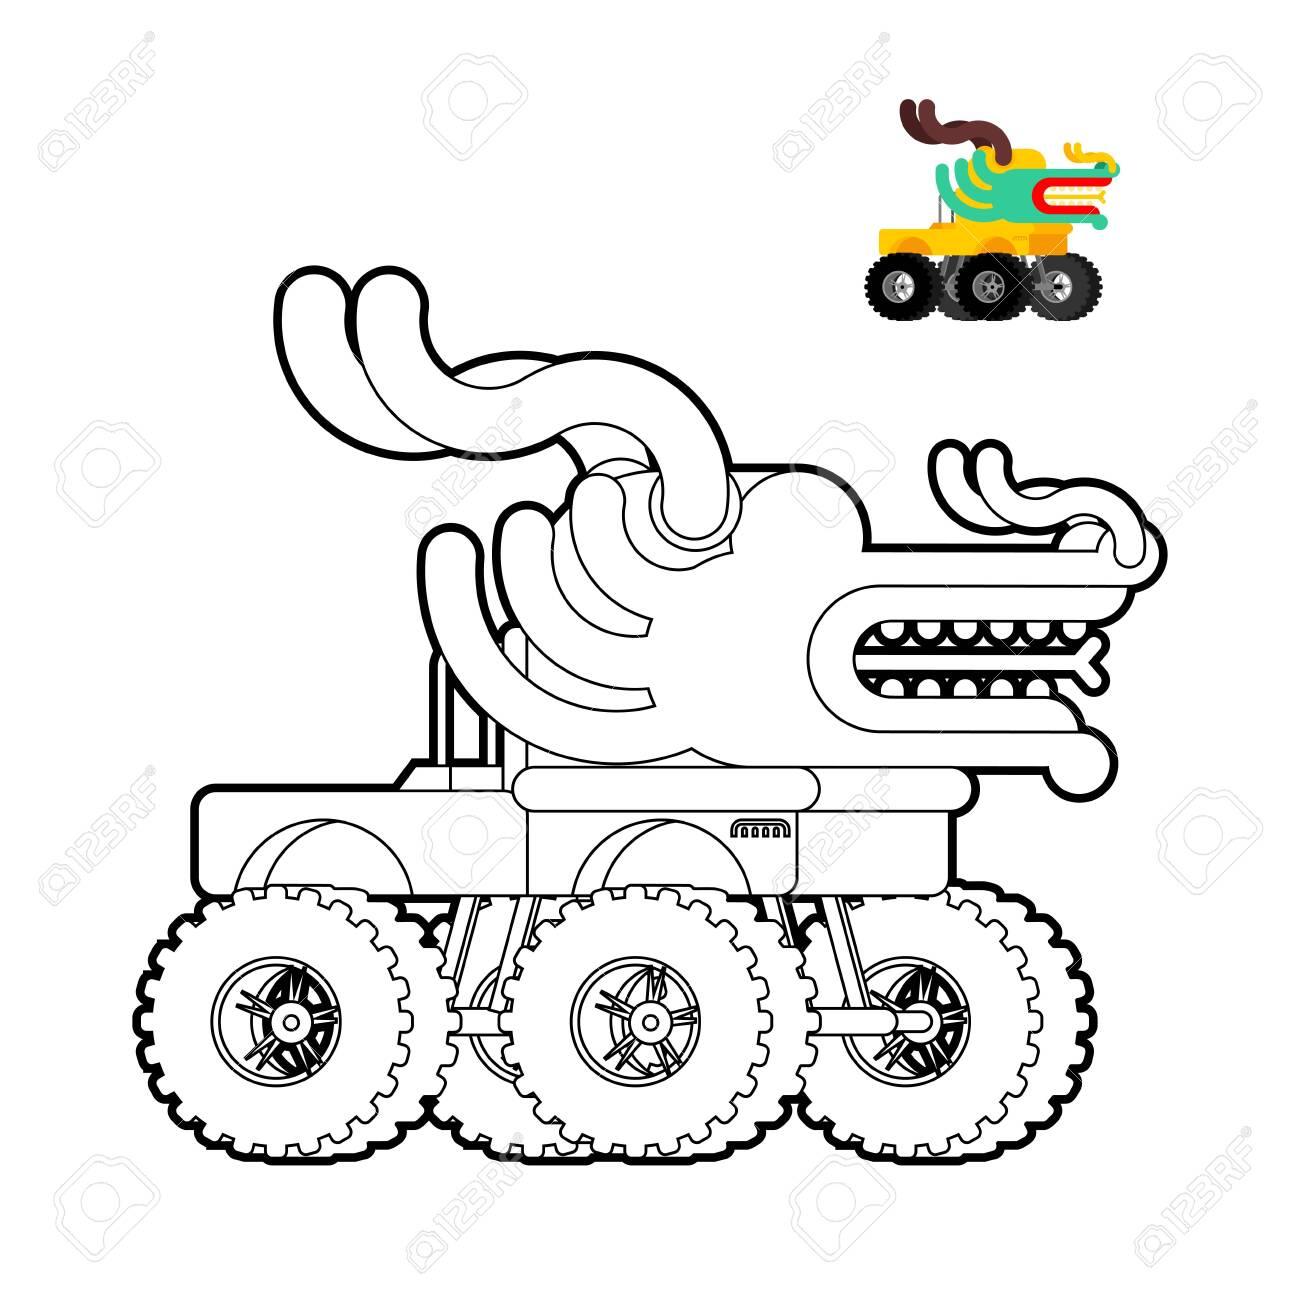 - Monster Truck Dragon Coloring Book. Animal Car On Big Wheels